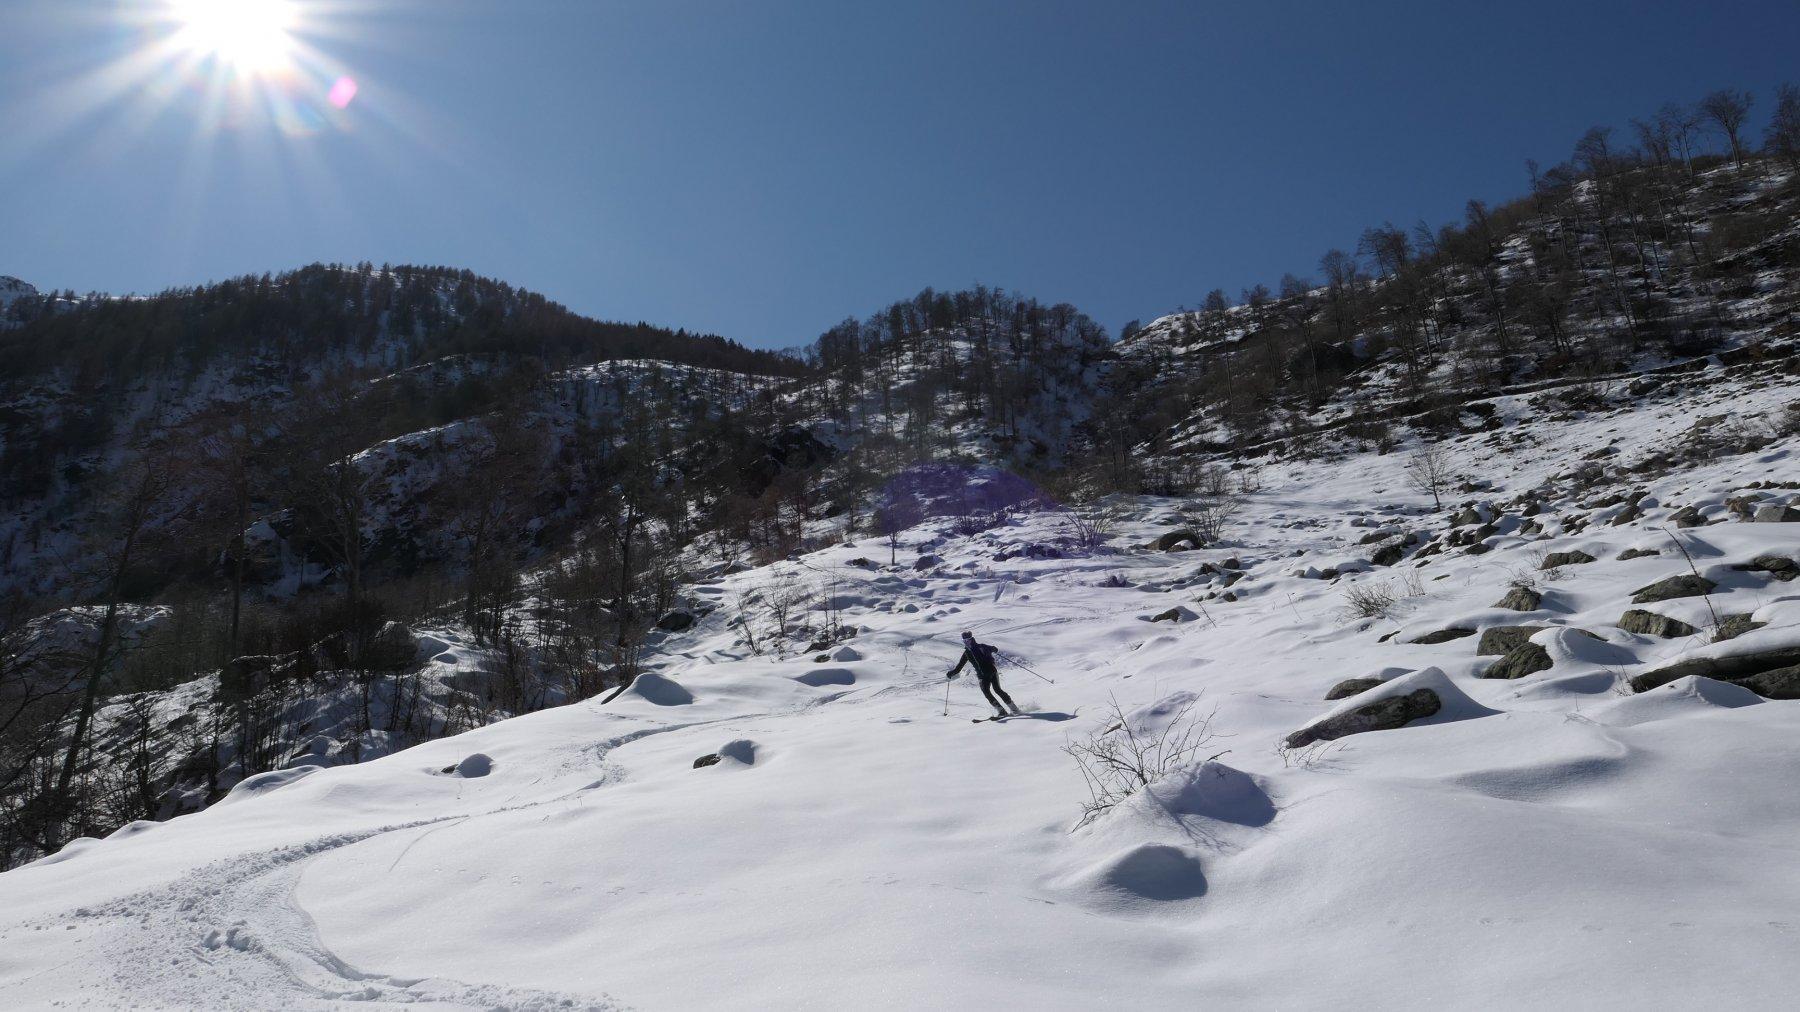 quota m.1400 ,qui neve al limite